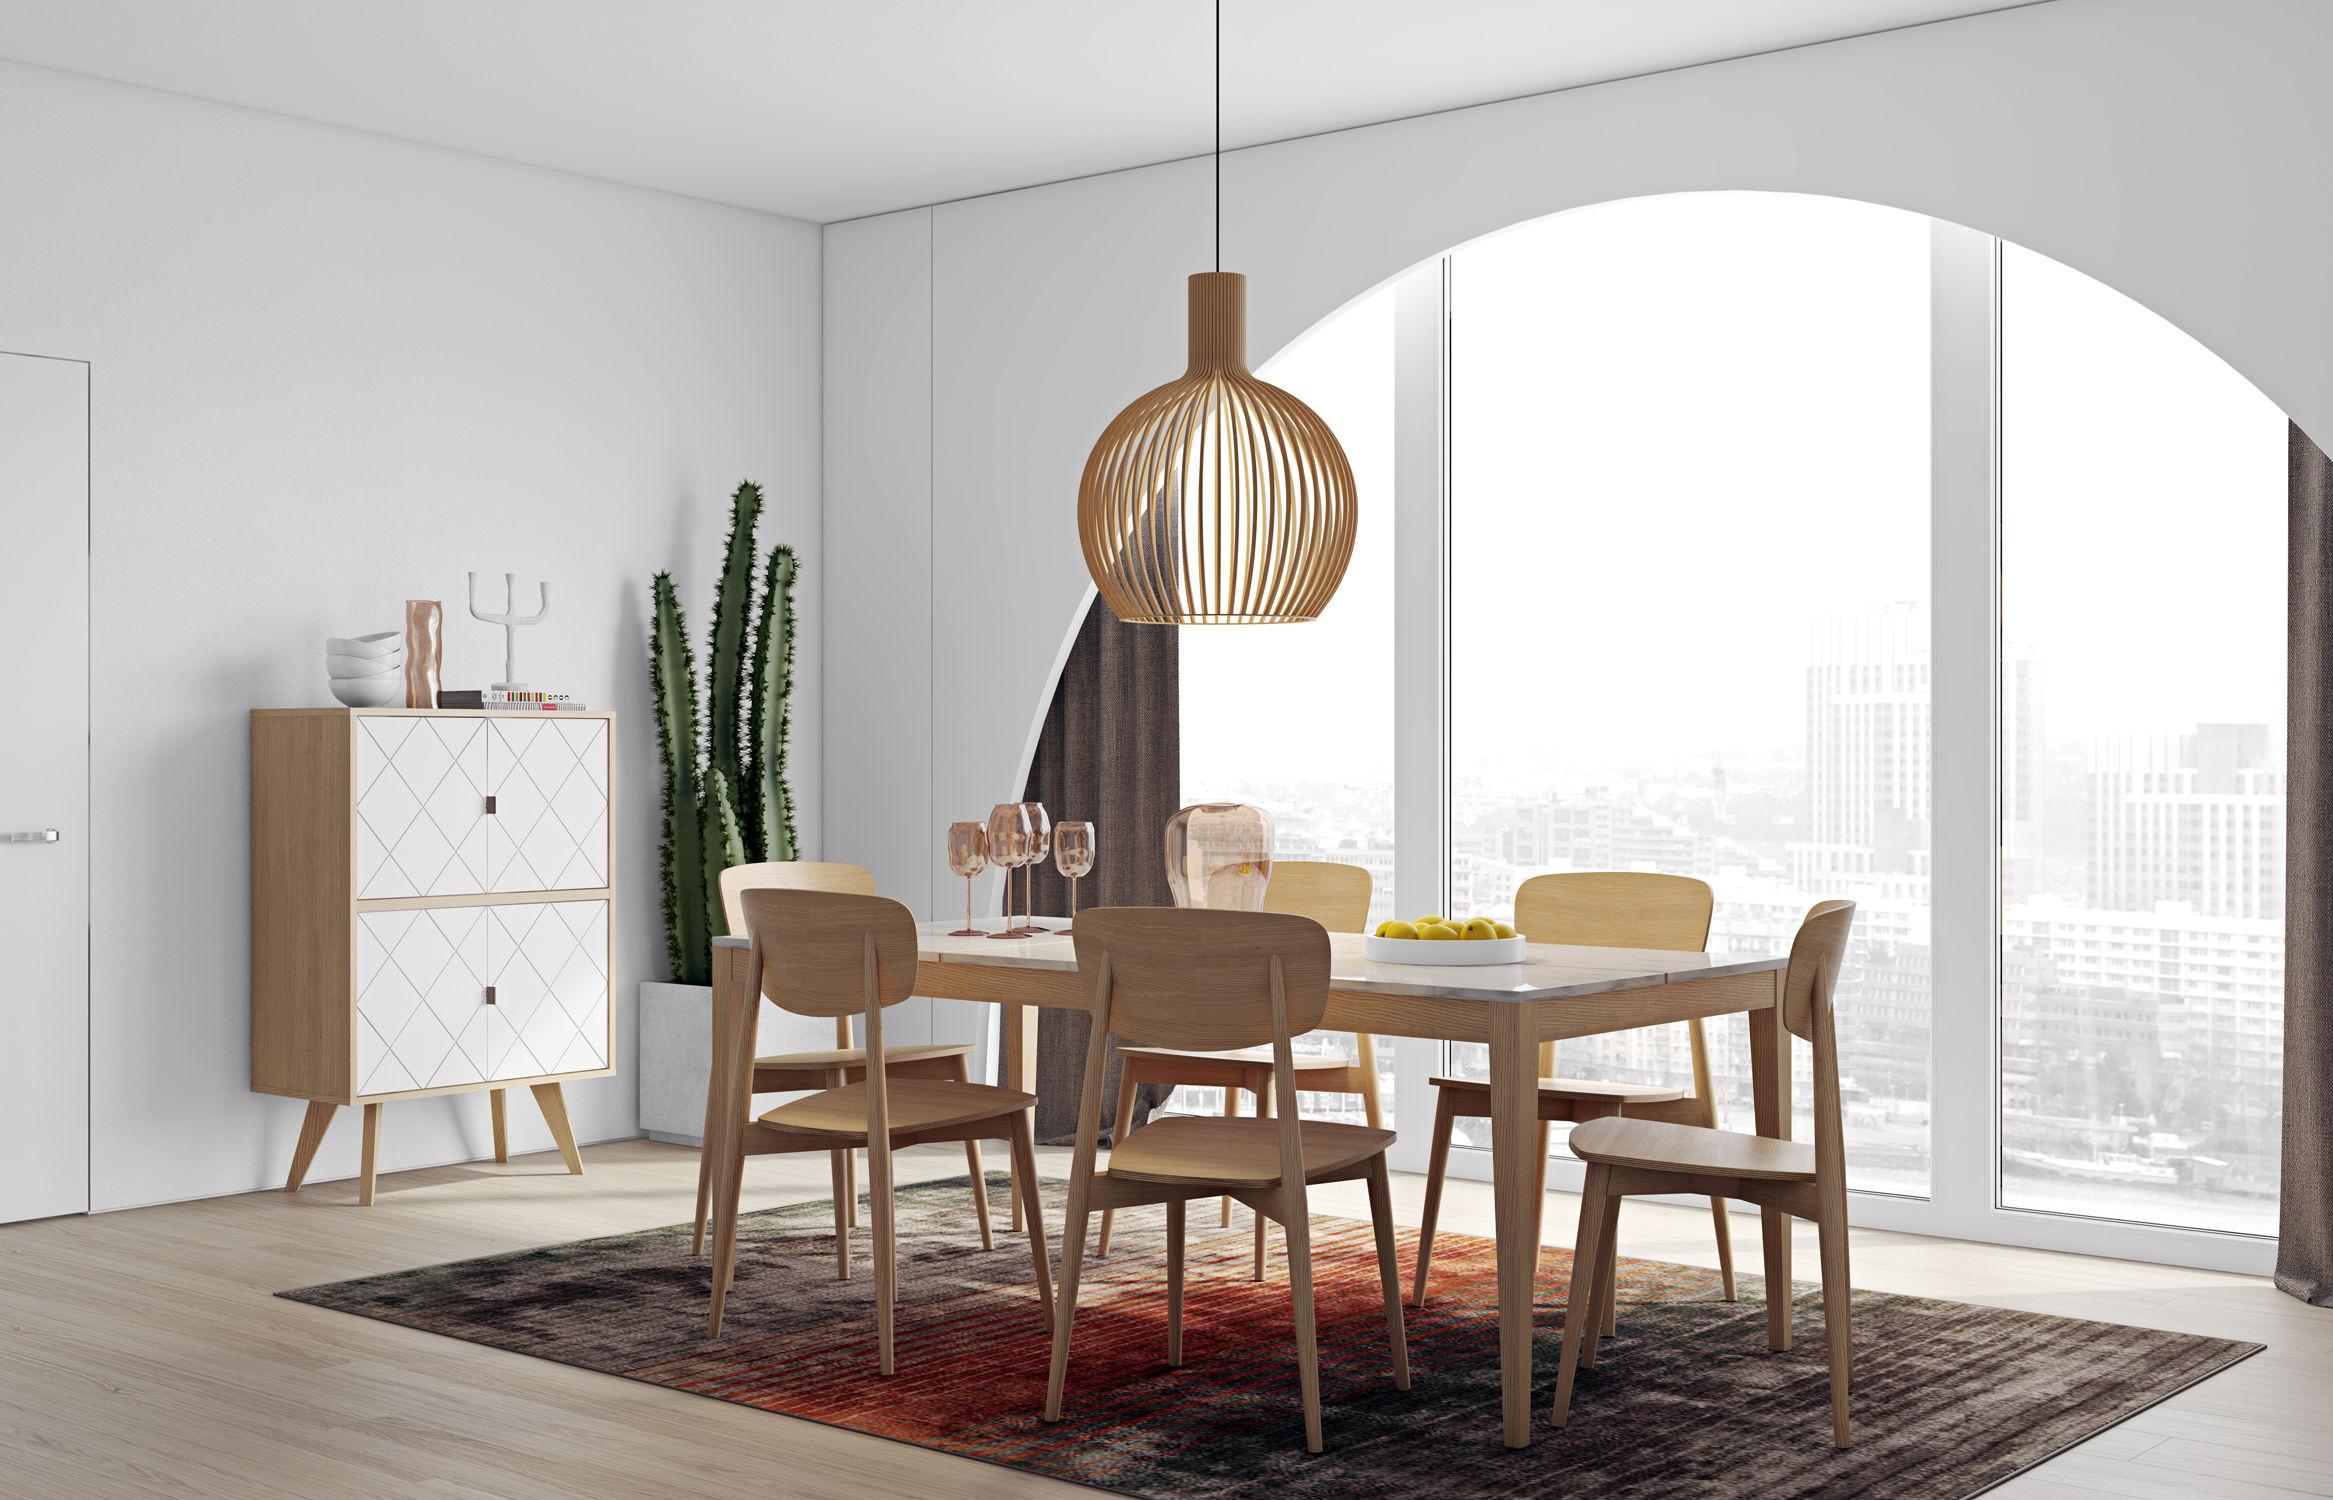 buffet butterfly haut l 80 x h 125 cm ch ne blanc pop up home made in design. Black Bedroom Furniture Sets. Home Design Ideas